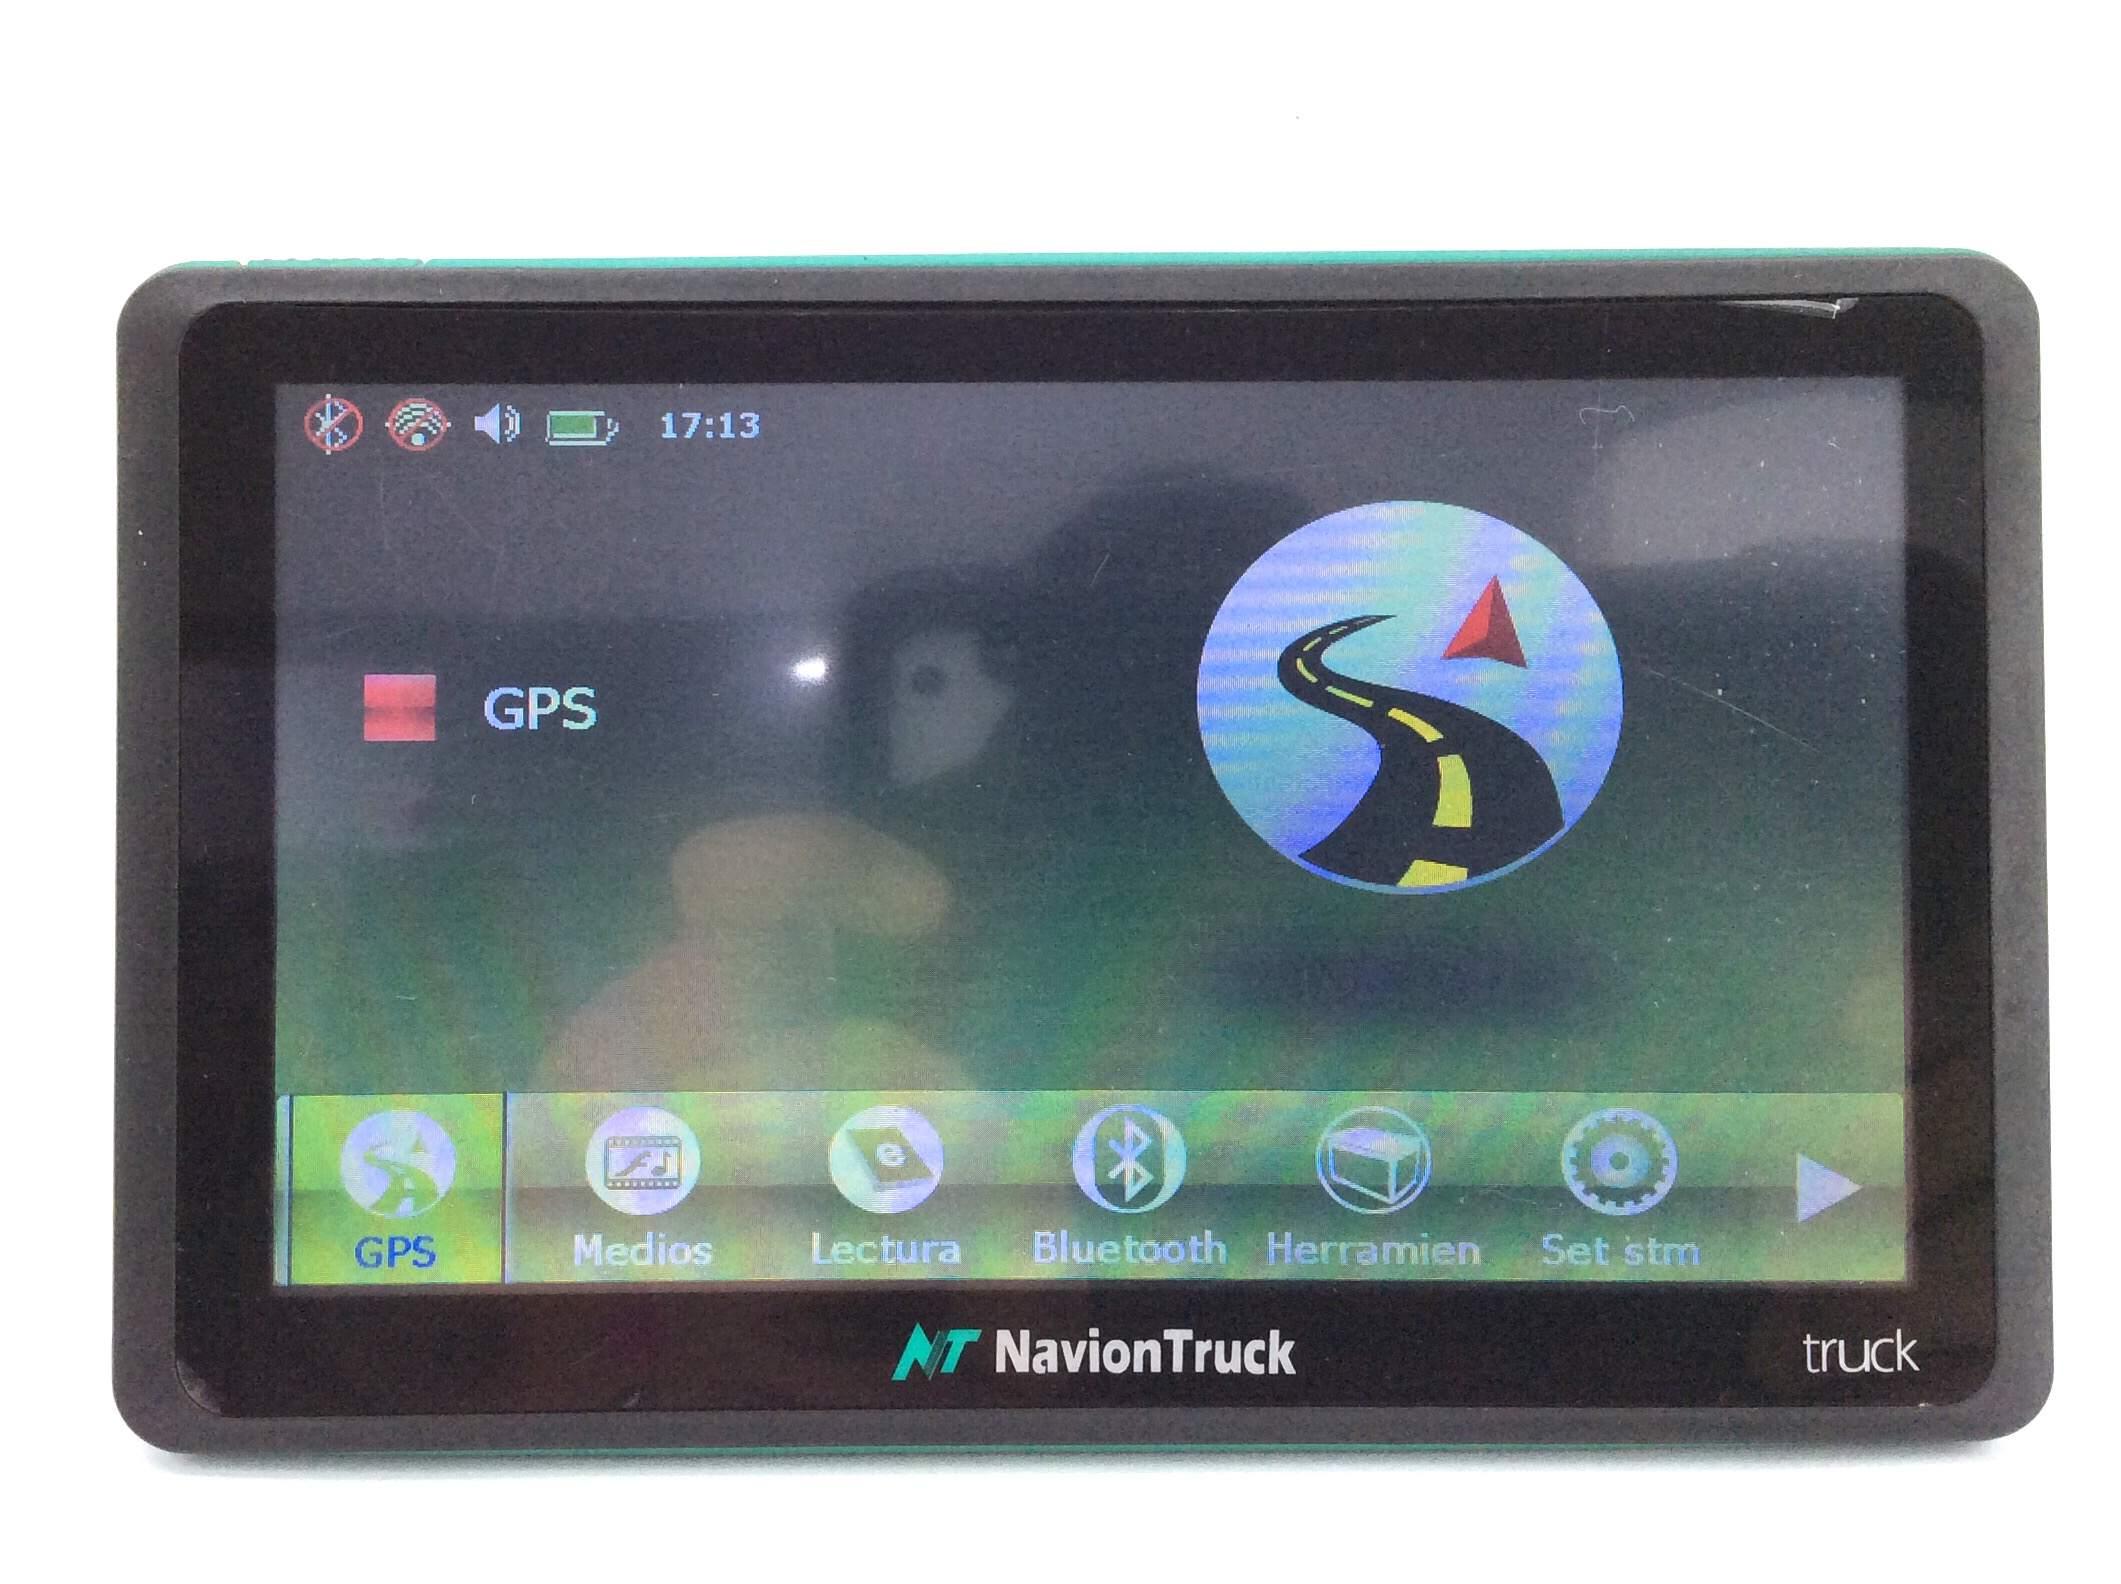 SISTEMA NAVEGACION GPS NAVIONTRUCK X7 TRUCK ATLAS VI